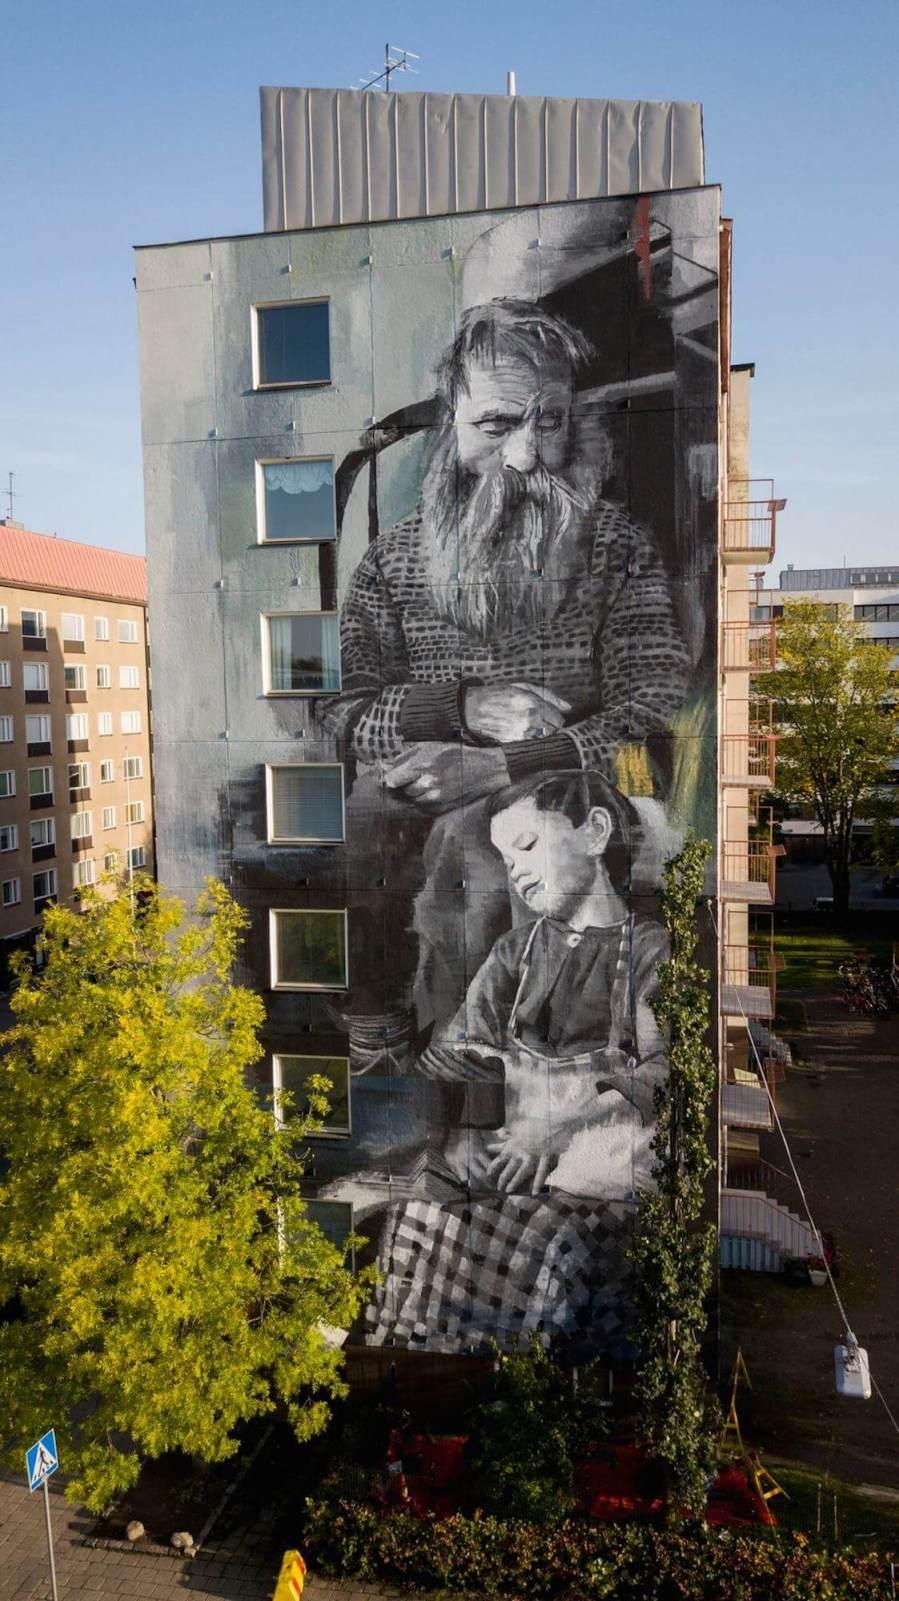 UPEA-upeart-street-art-festival-finland--Wasp-Elder-pc-wasp